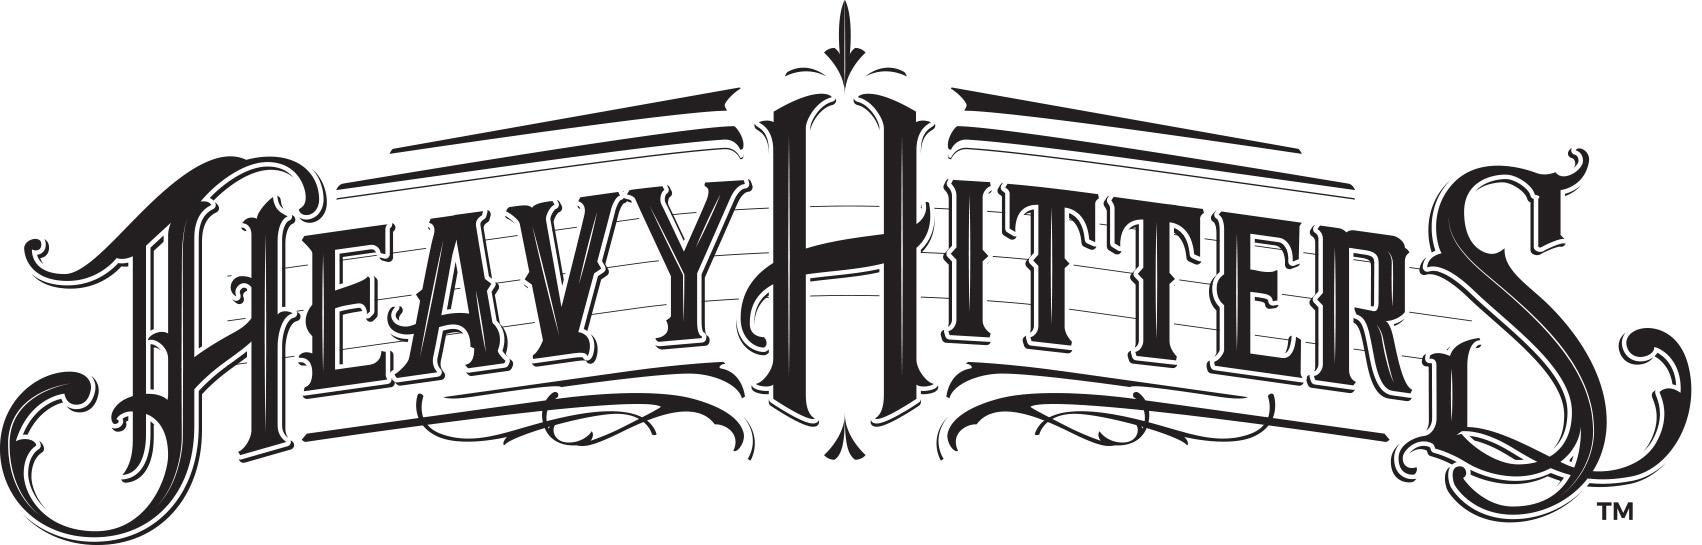 Heavy Hitters - Horizontal Logo - Black.jpg